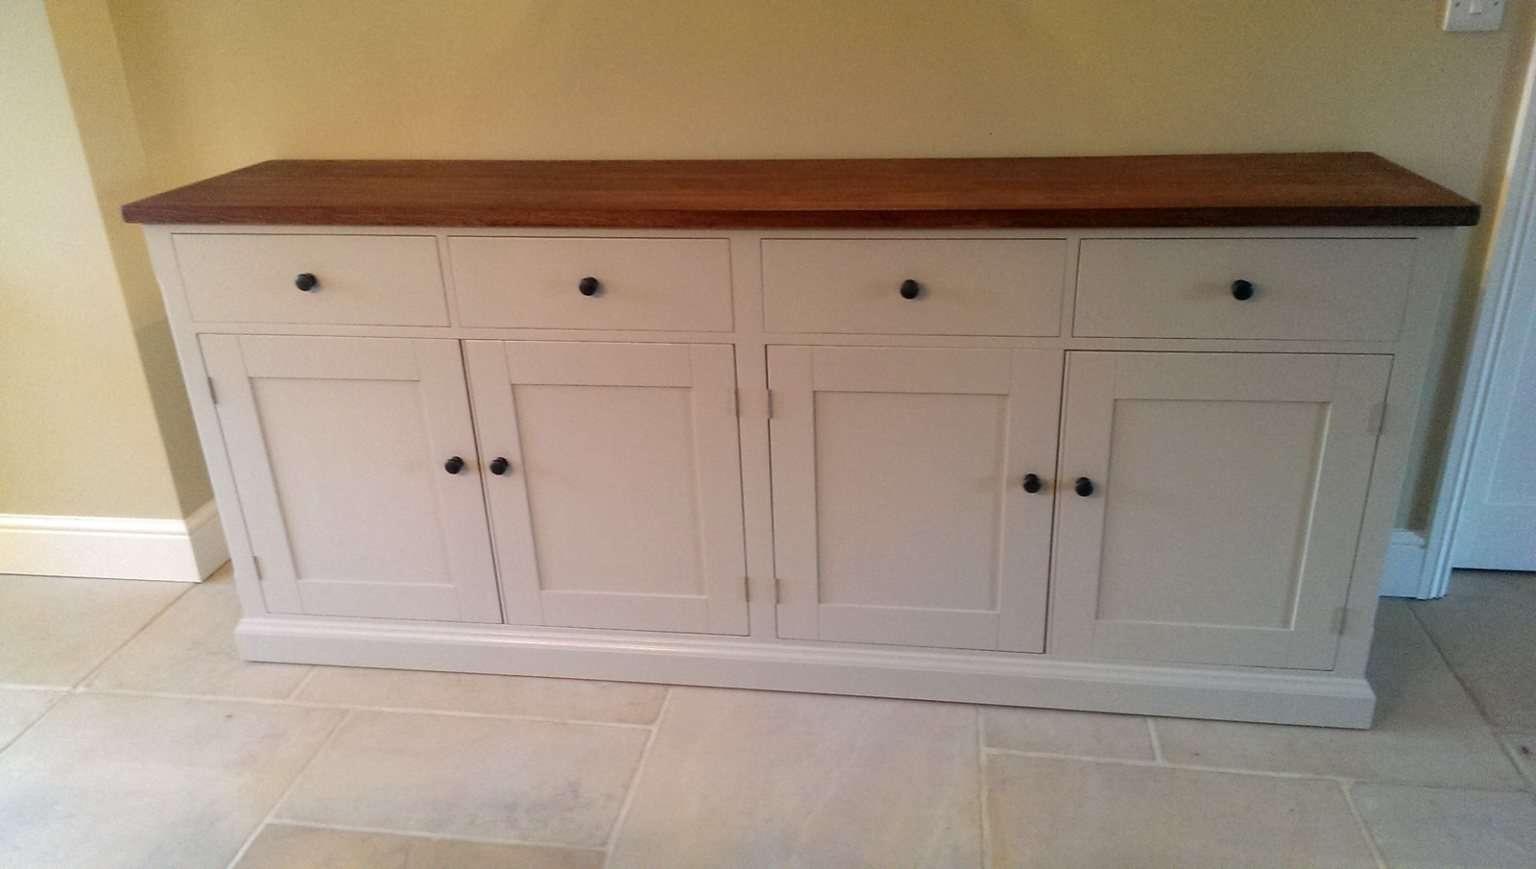 Bespoke Large Painted Sideboard With Oak Top – Solid Wood Inside Bespoke Sideboards (View 4 of 20)